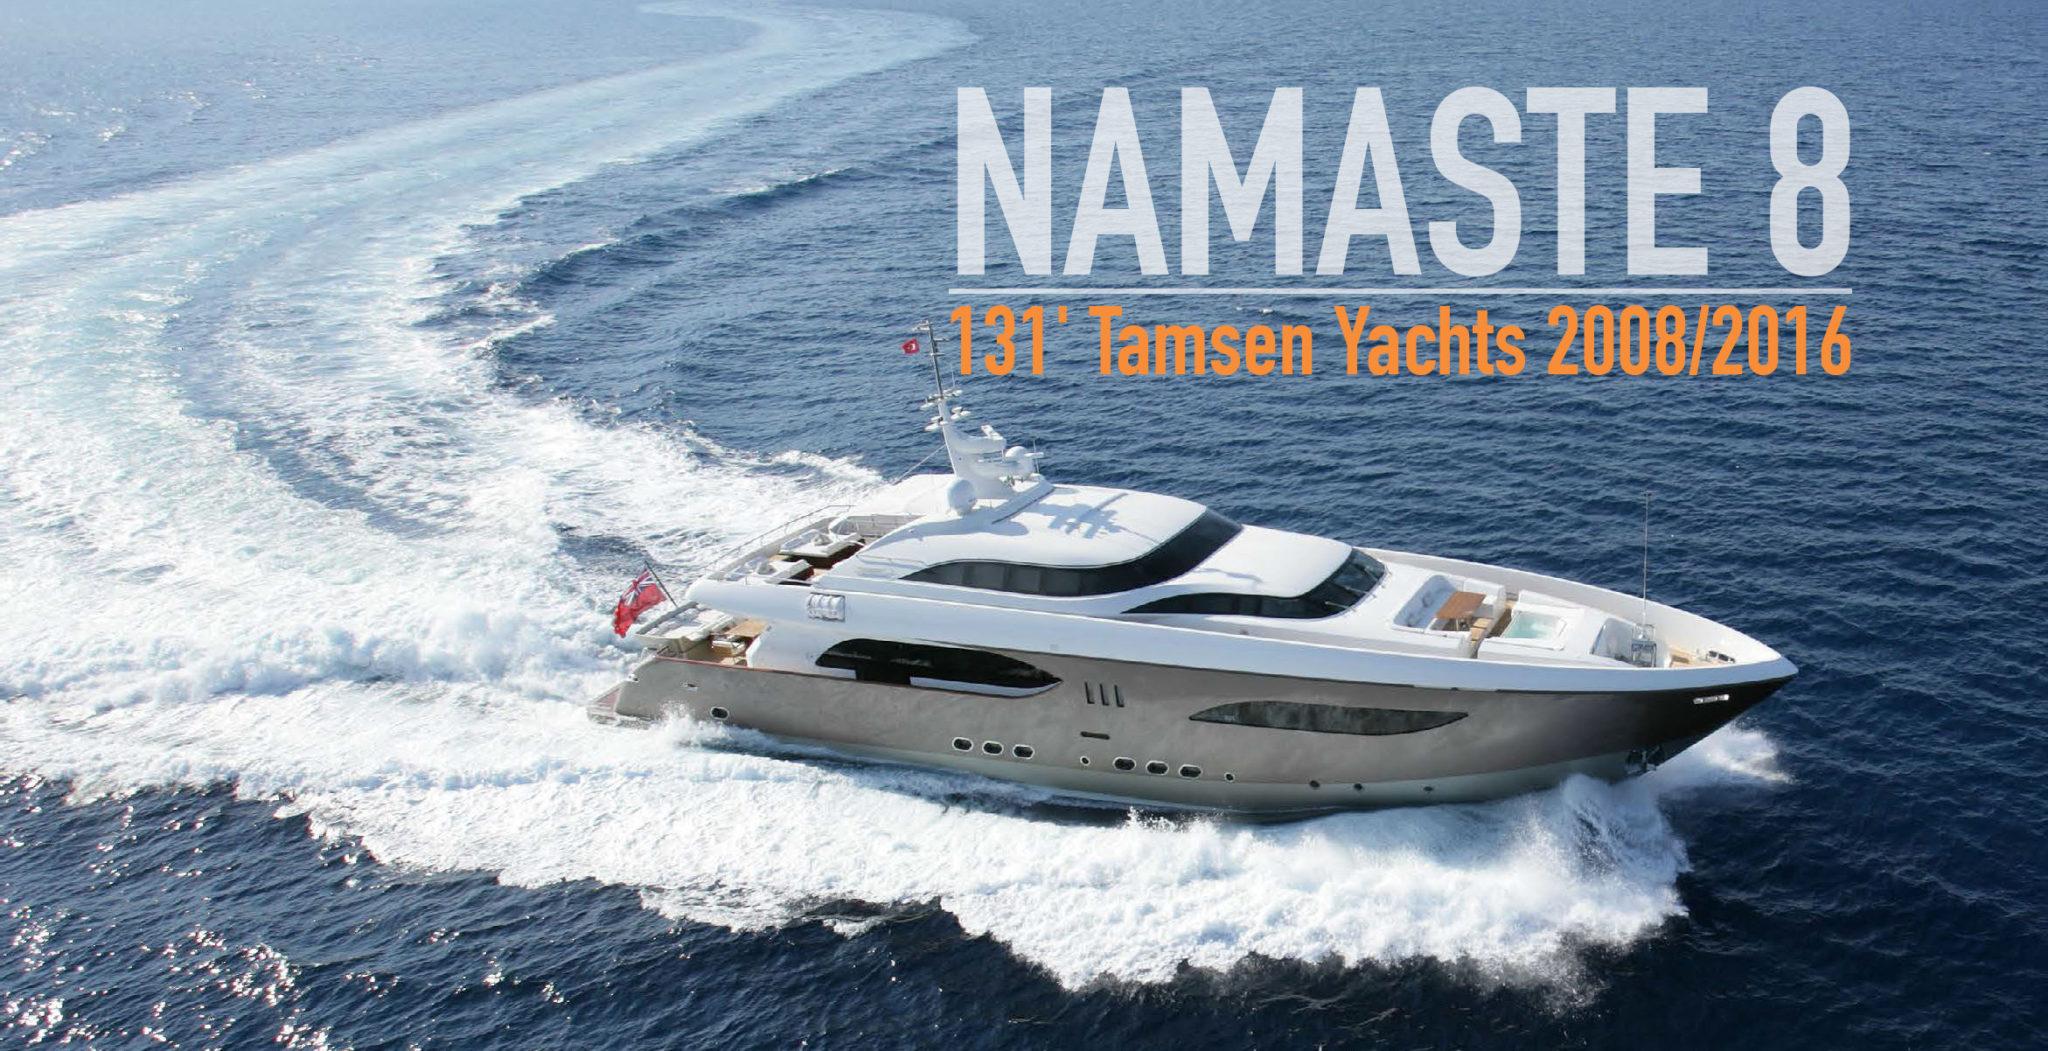 NAMASTE 8 131′ Tamsen Yachts 2008/2016 – New Listing!